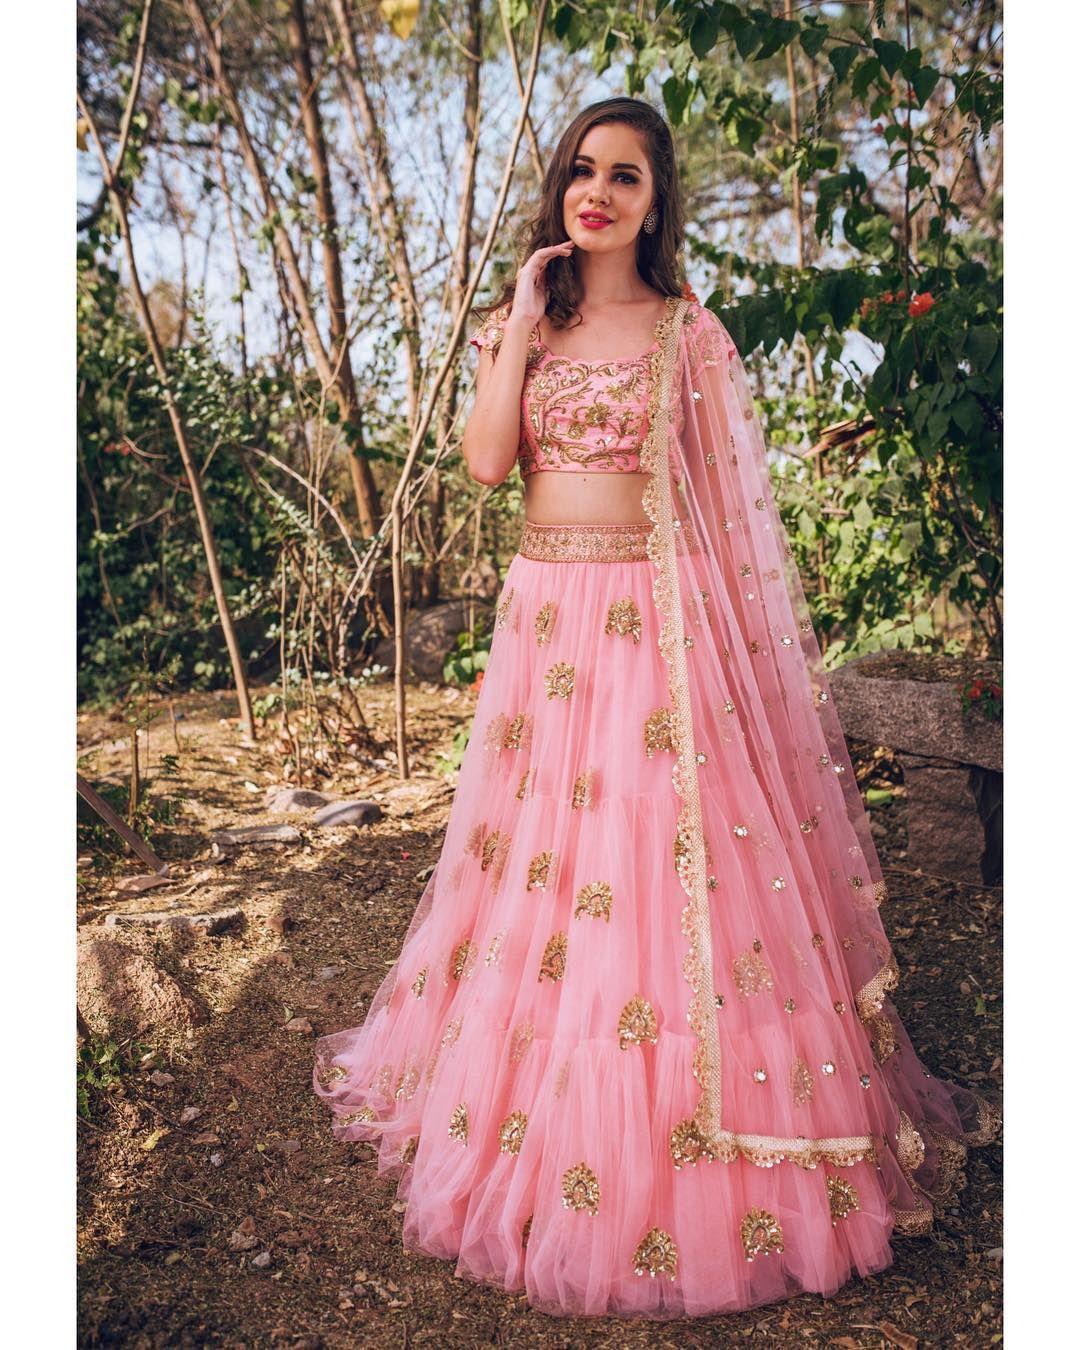 Pink dress design 2018  Stunning blush pink color designer lehenga and blouse with net